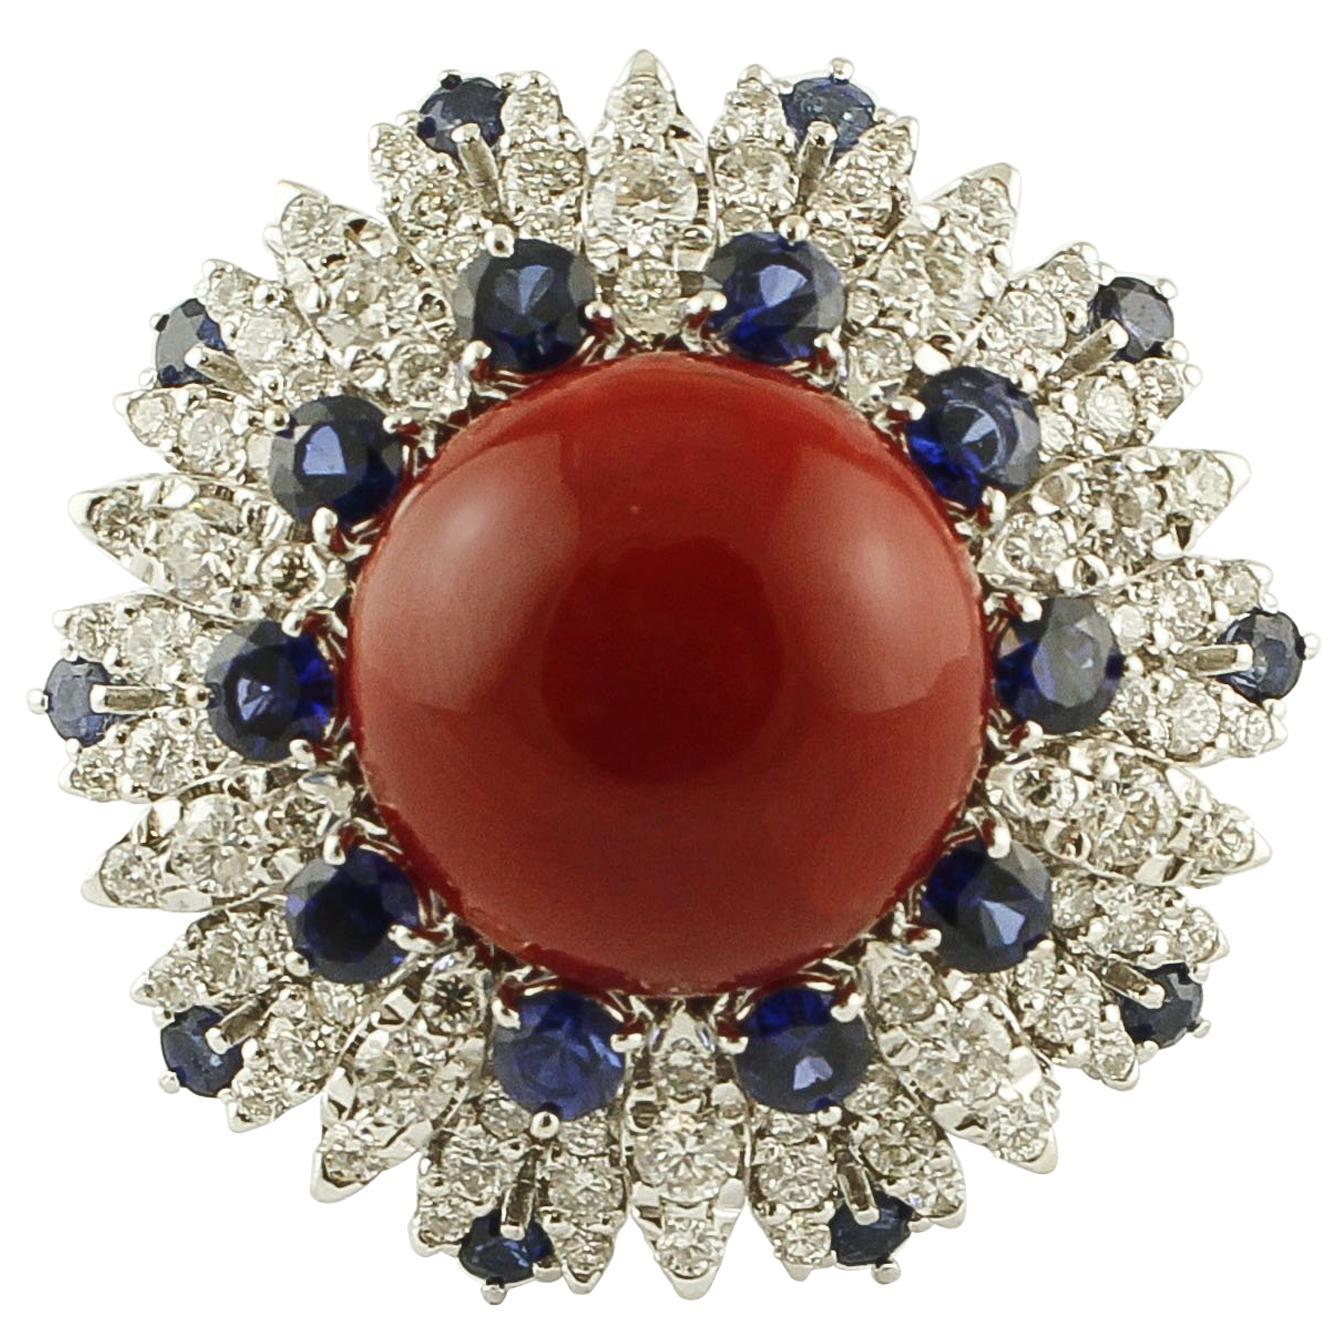 Diamonds, Blue Sapphires, Red Coral Button, 14 Karat White Gold Ring